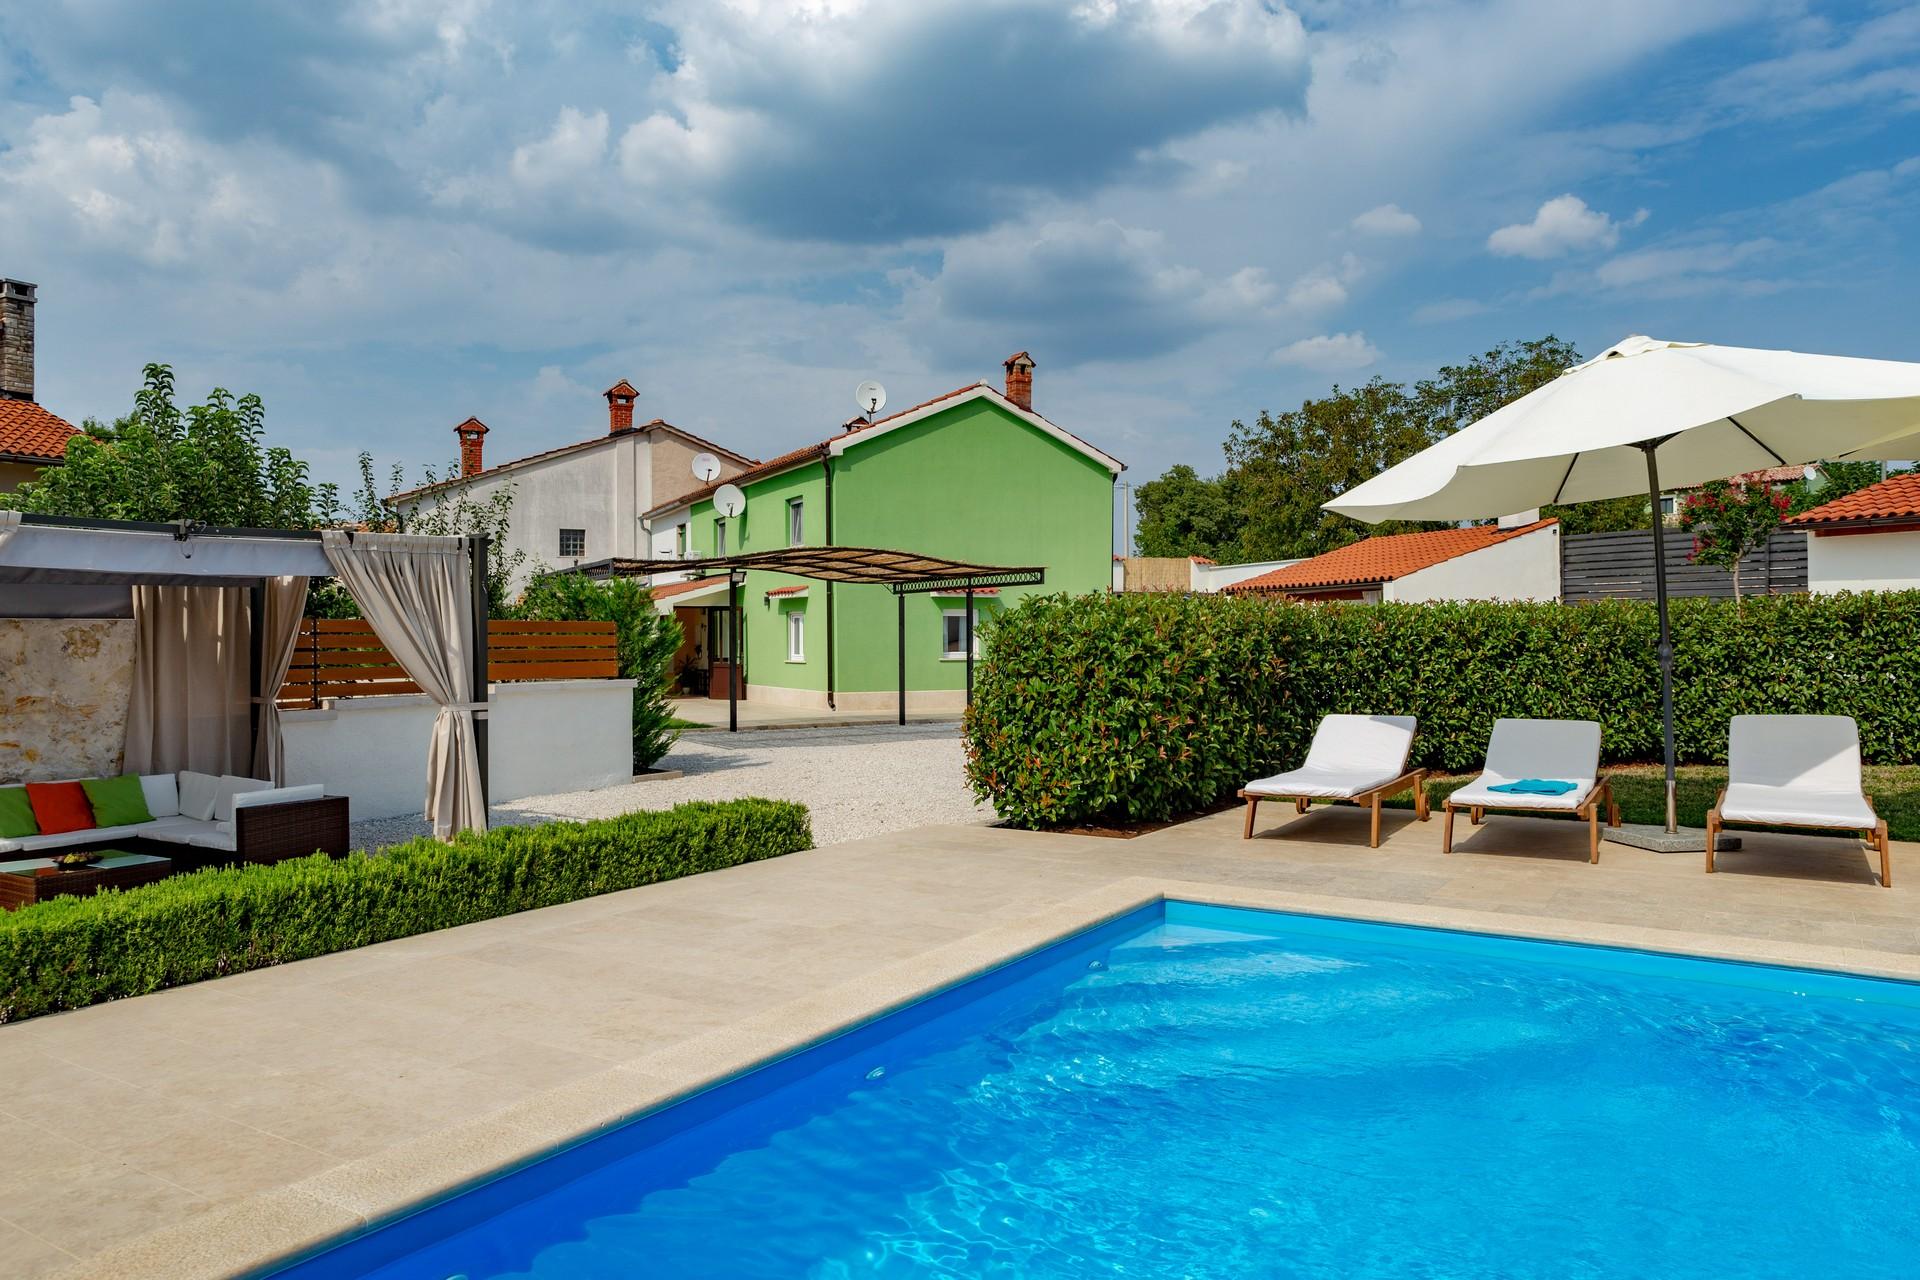 villa deal outdoors (4)